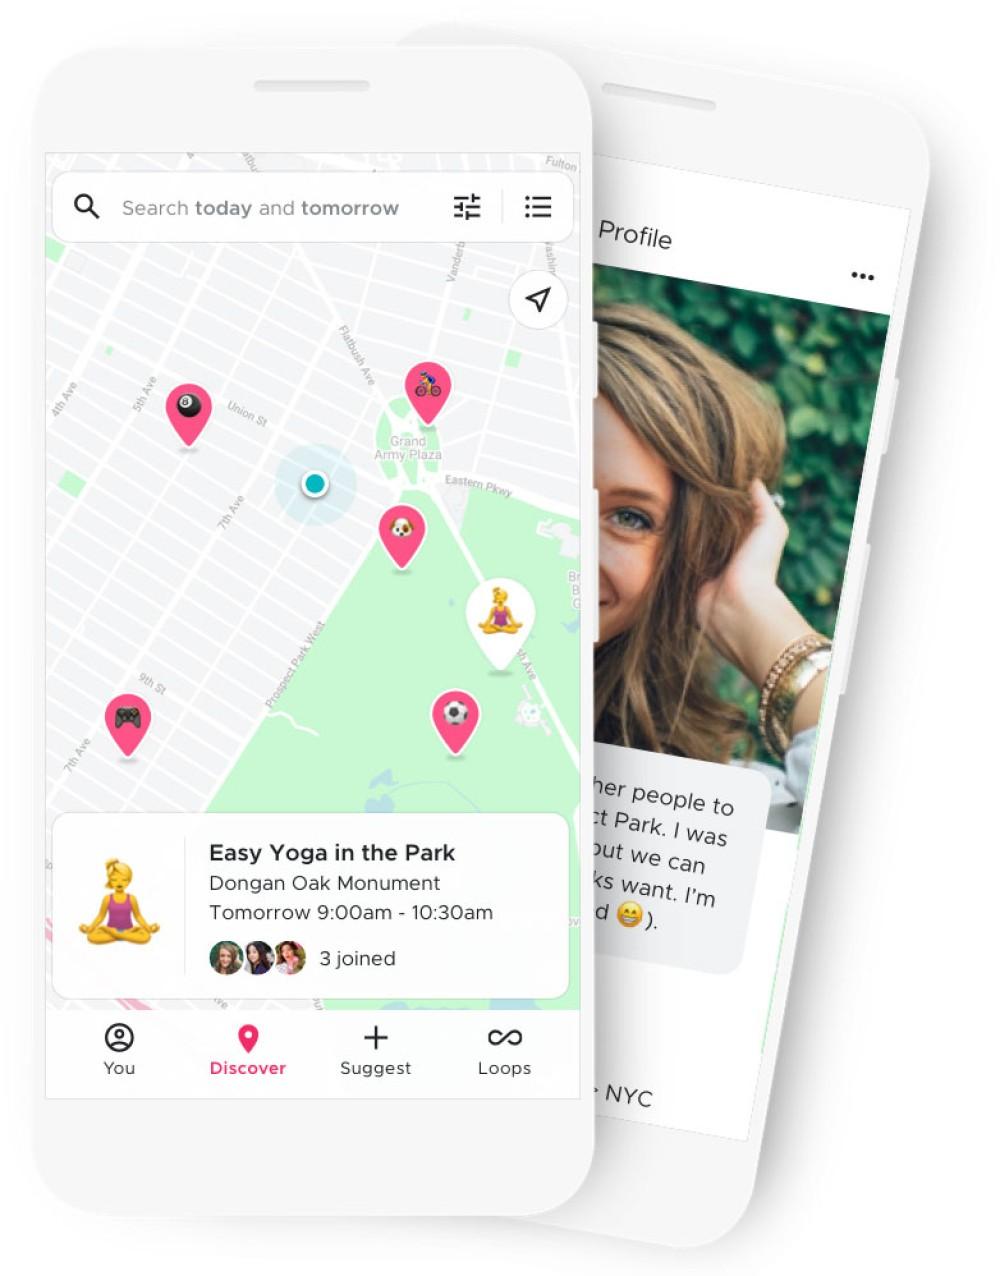 Shoelace: Το νέο social εγχείρημα της Google